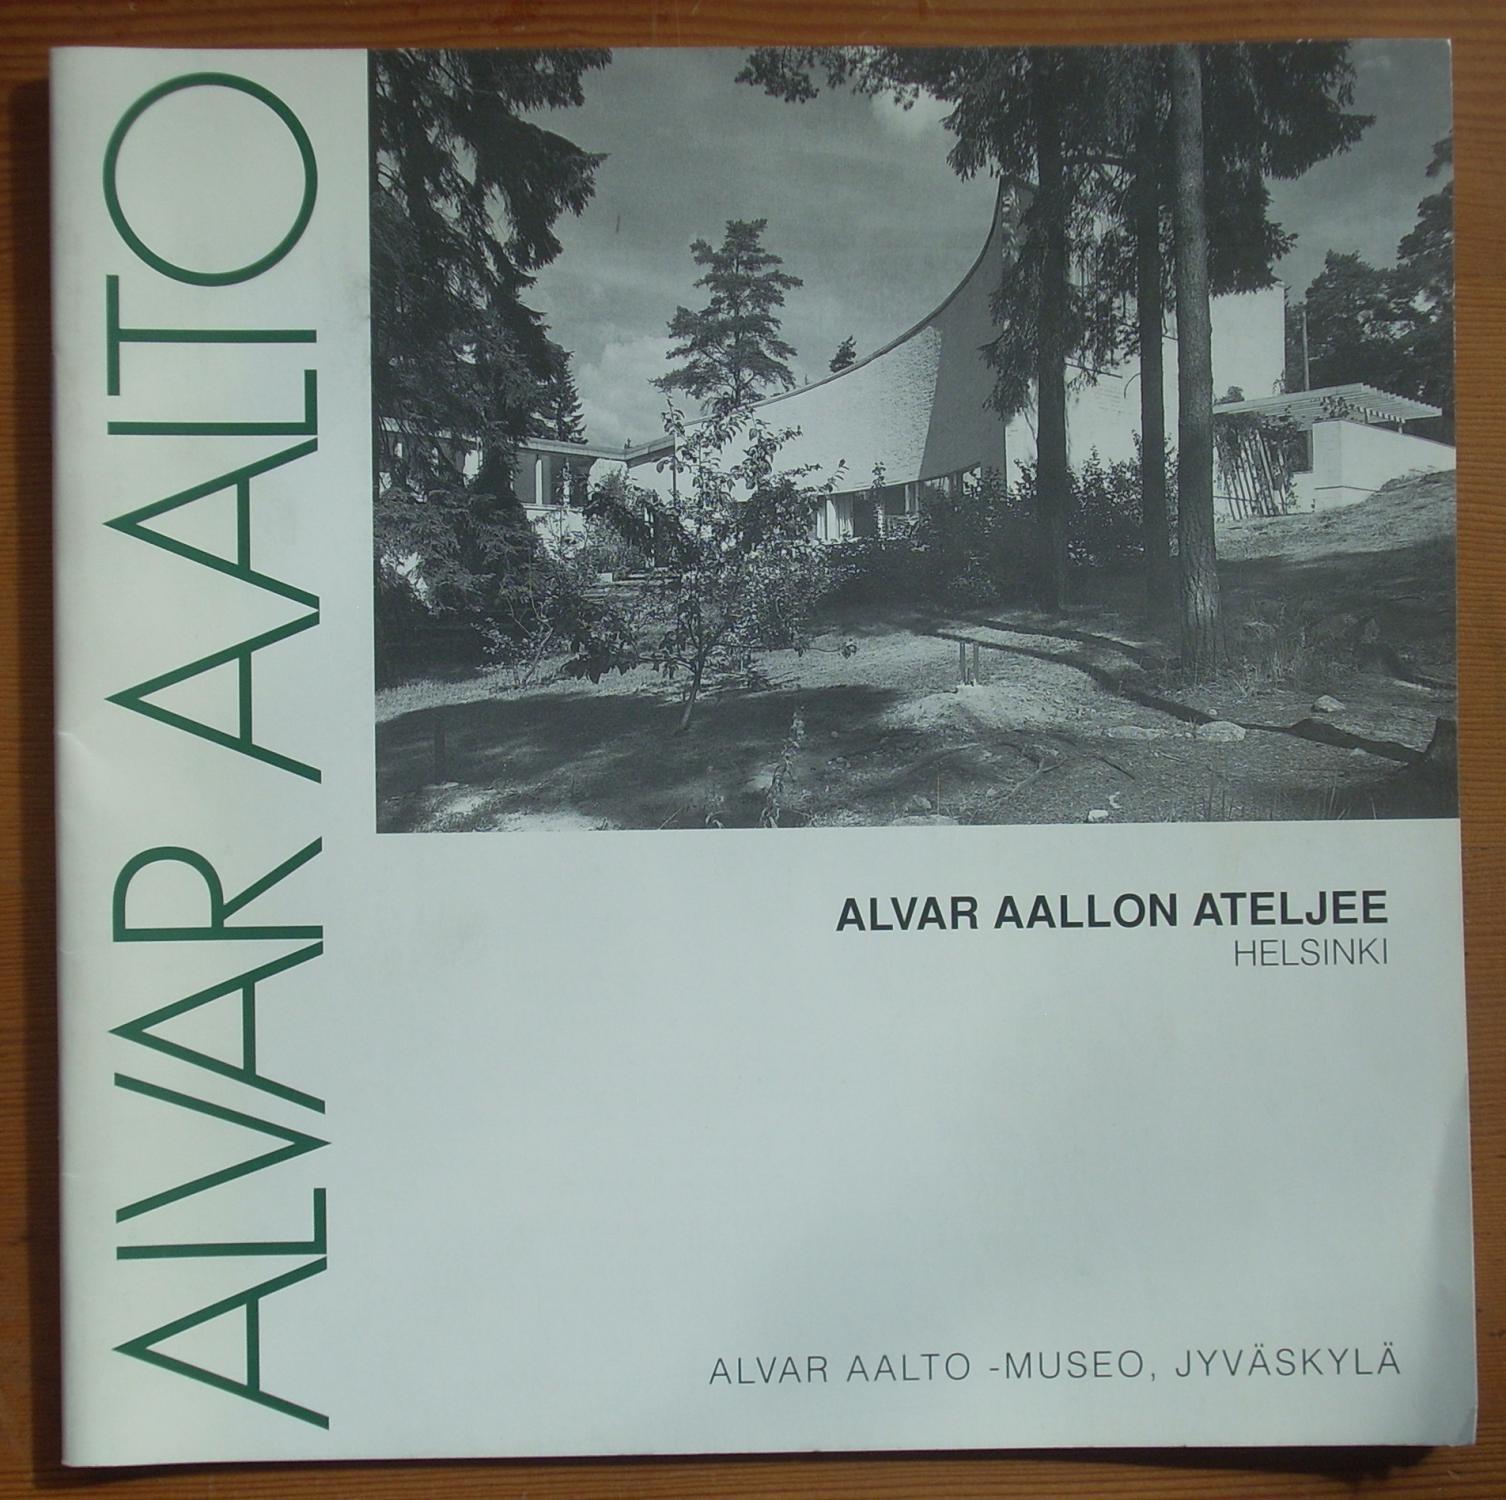 alvar aalto finlandia vase of alvar aalto abebooks within 22379364738